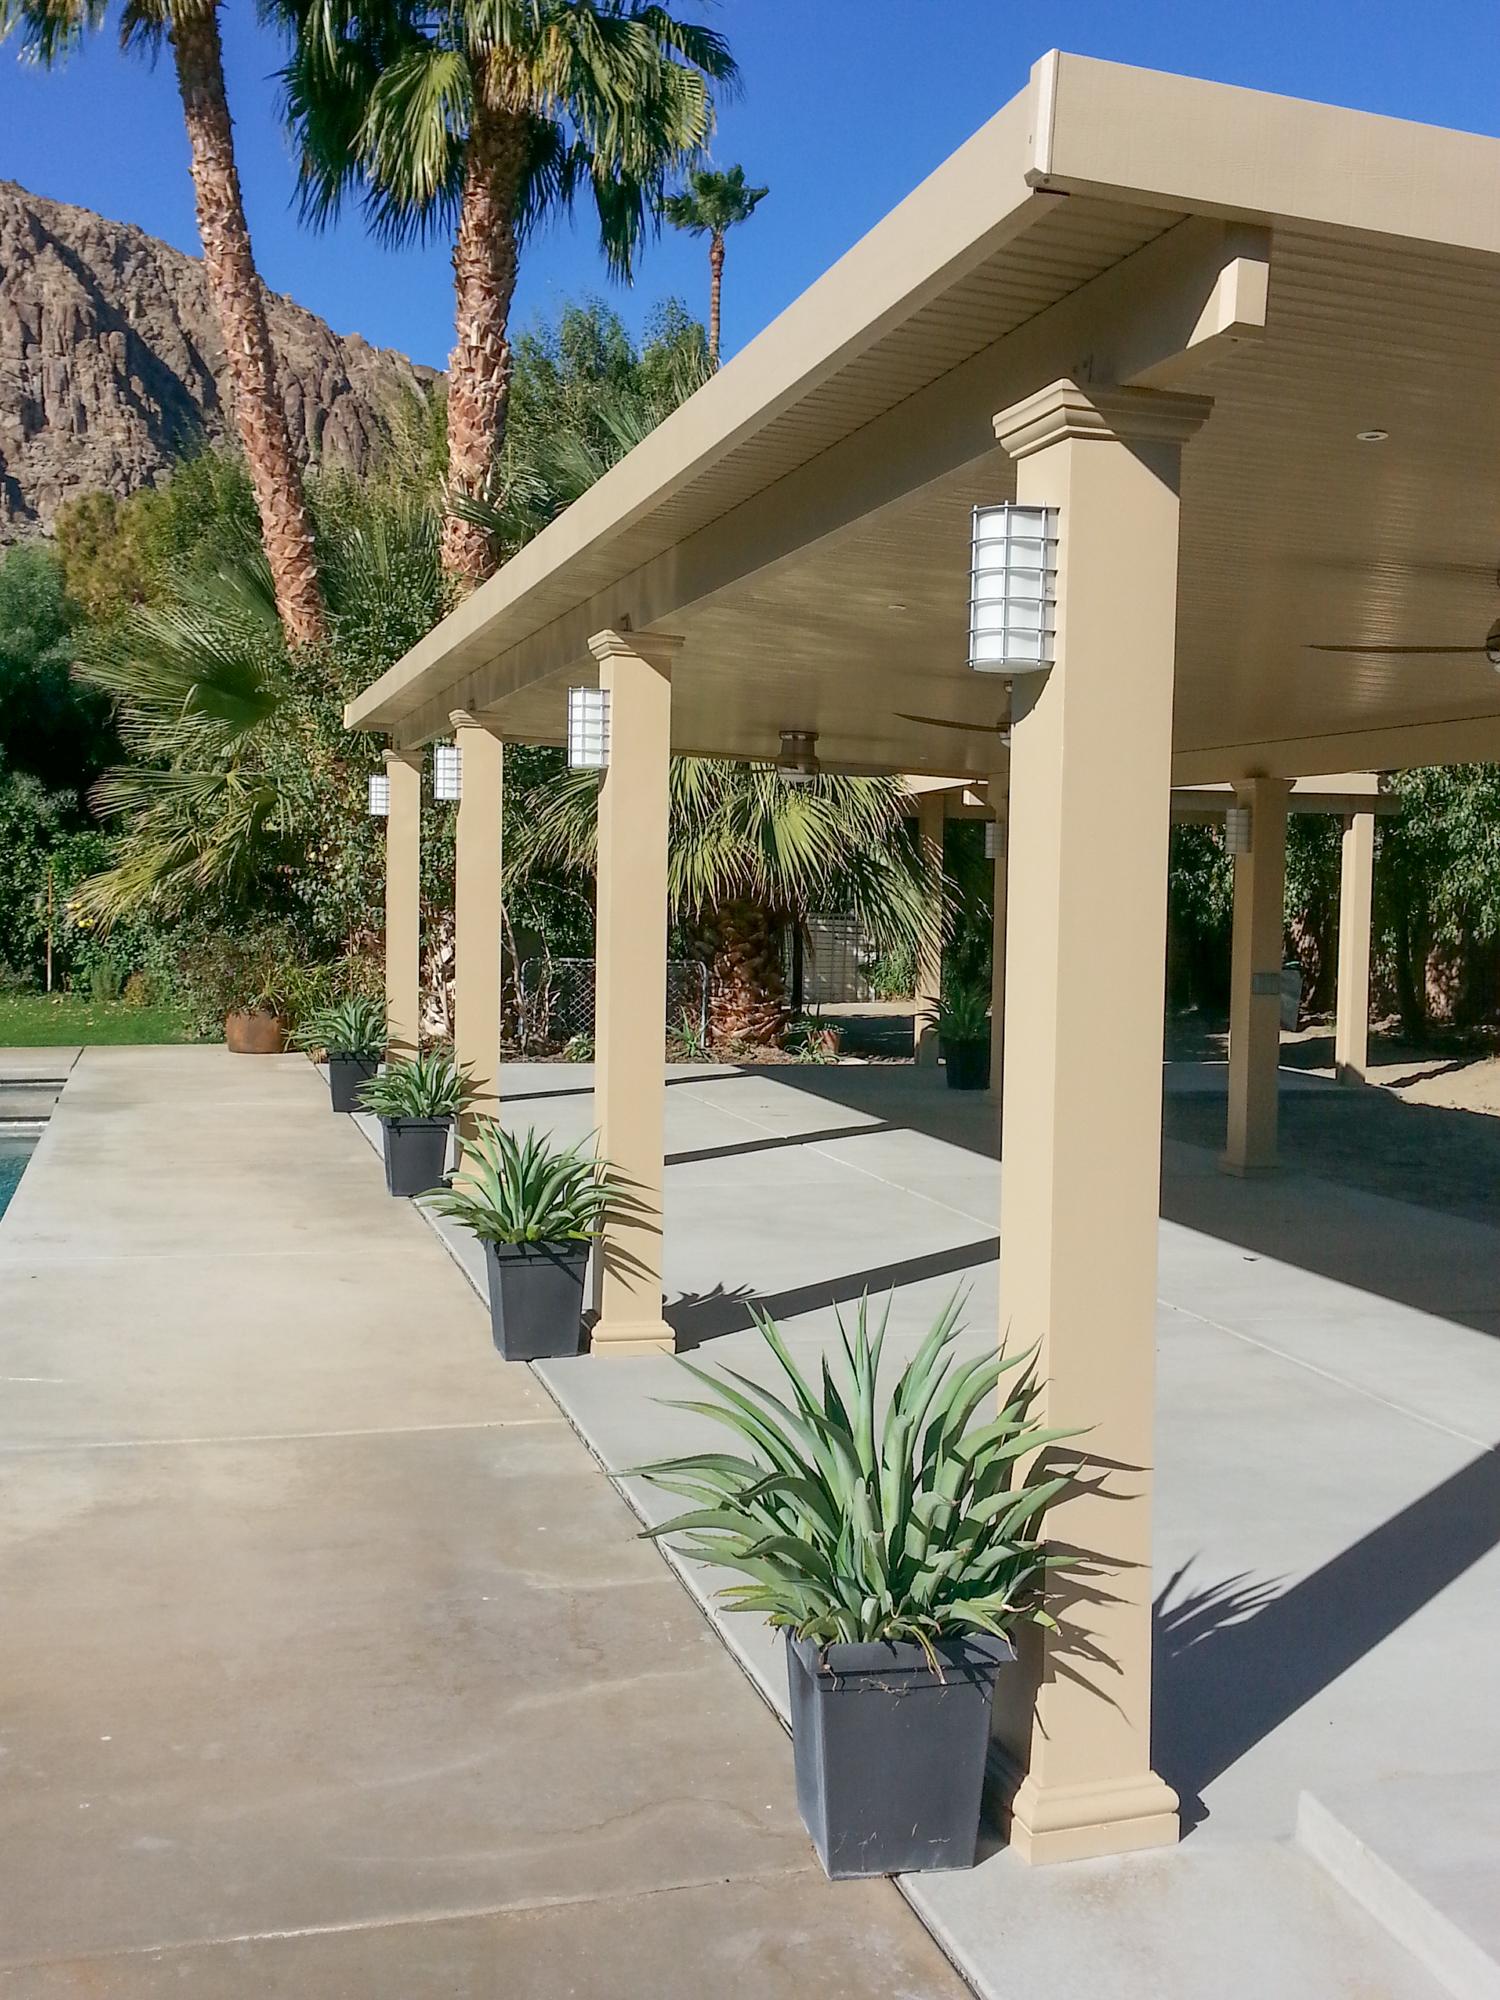 Custom Outdoor Lighting with 8-Inch Square Columns, La Quinta, CA